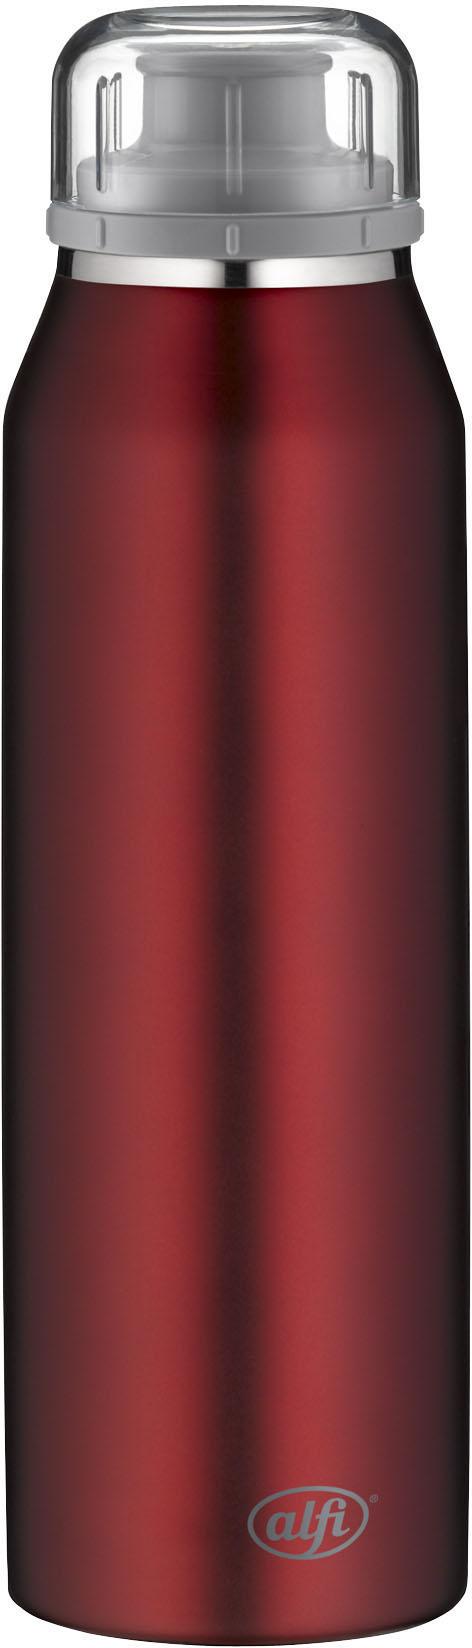 Alfi Thermoflasche Pure, 500 ml rot Campinggeschirr Camping Schlafen Outdoor